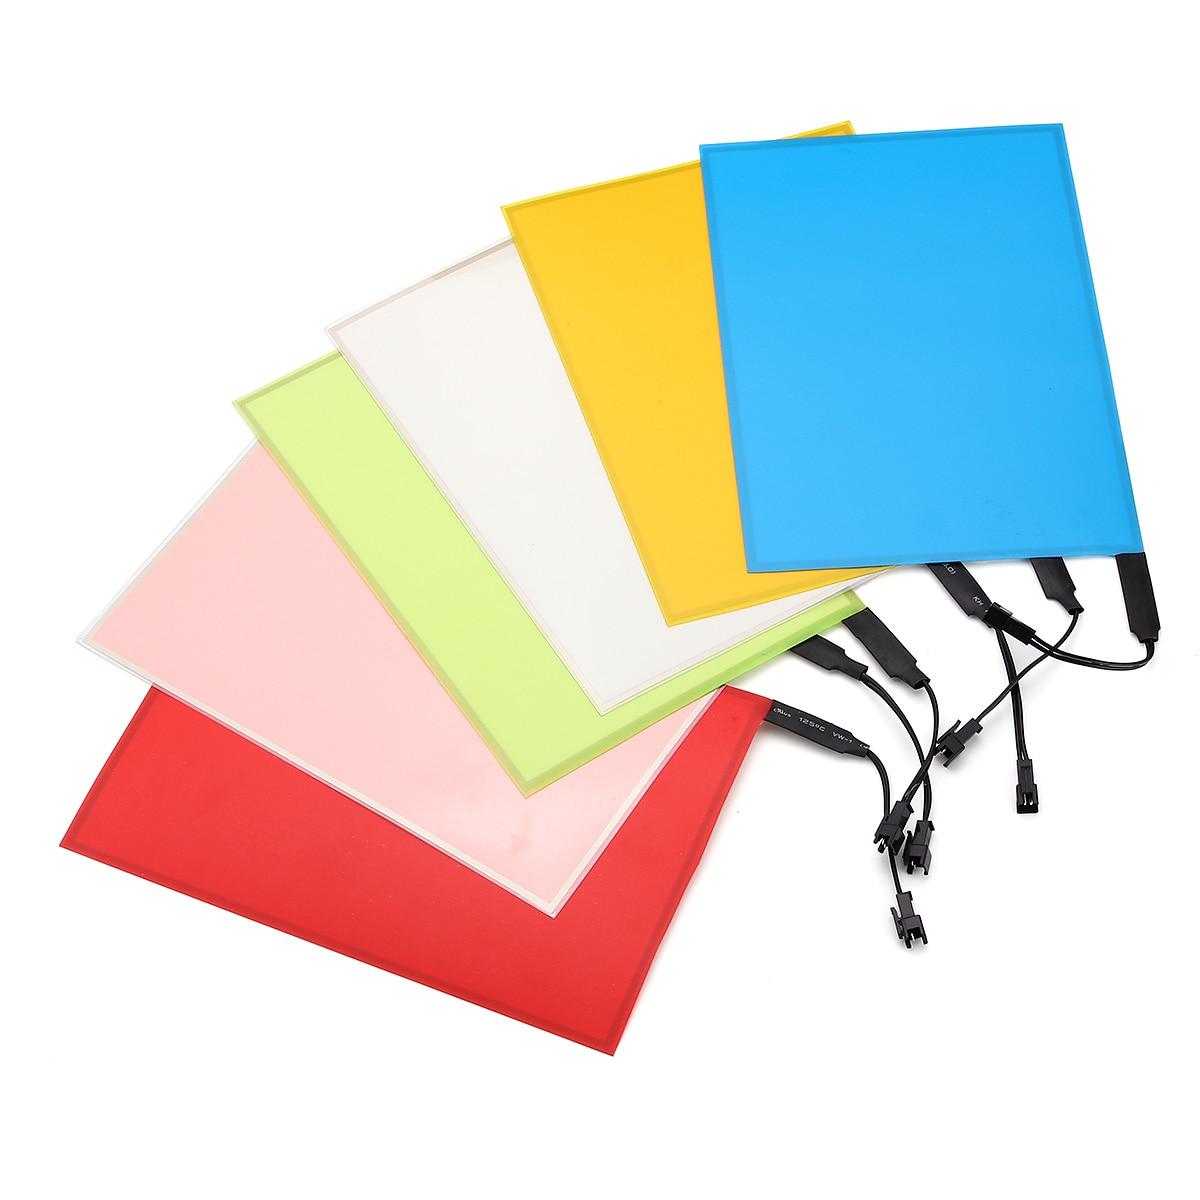 12V A5 21x14.8cm EL Panel Light Flexible Electroluminescent Light With Inverter Paper Neon Sheet